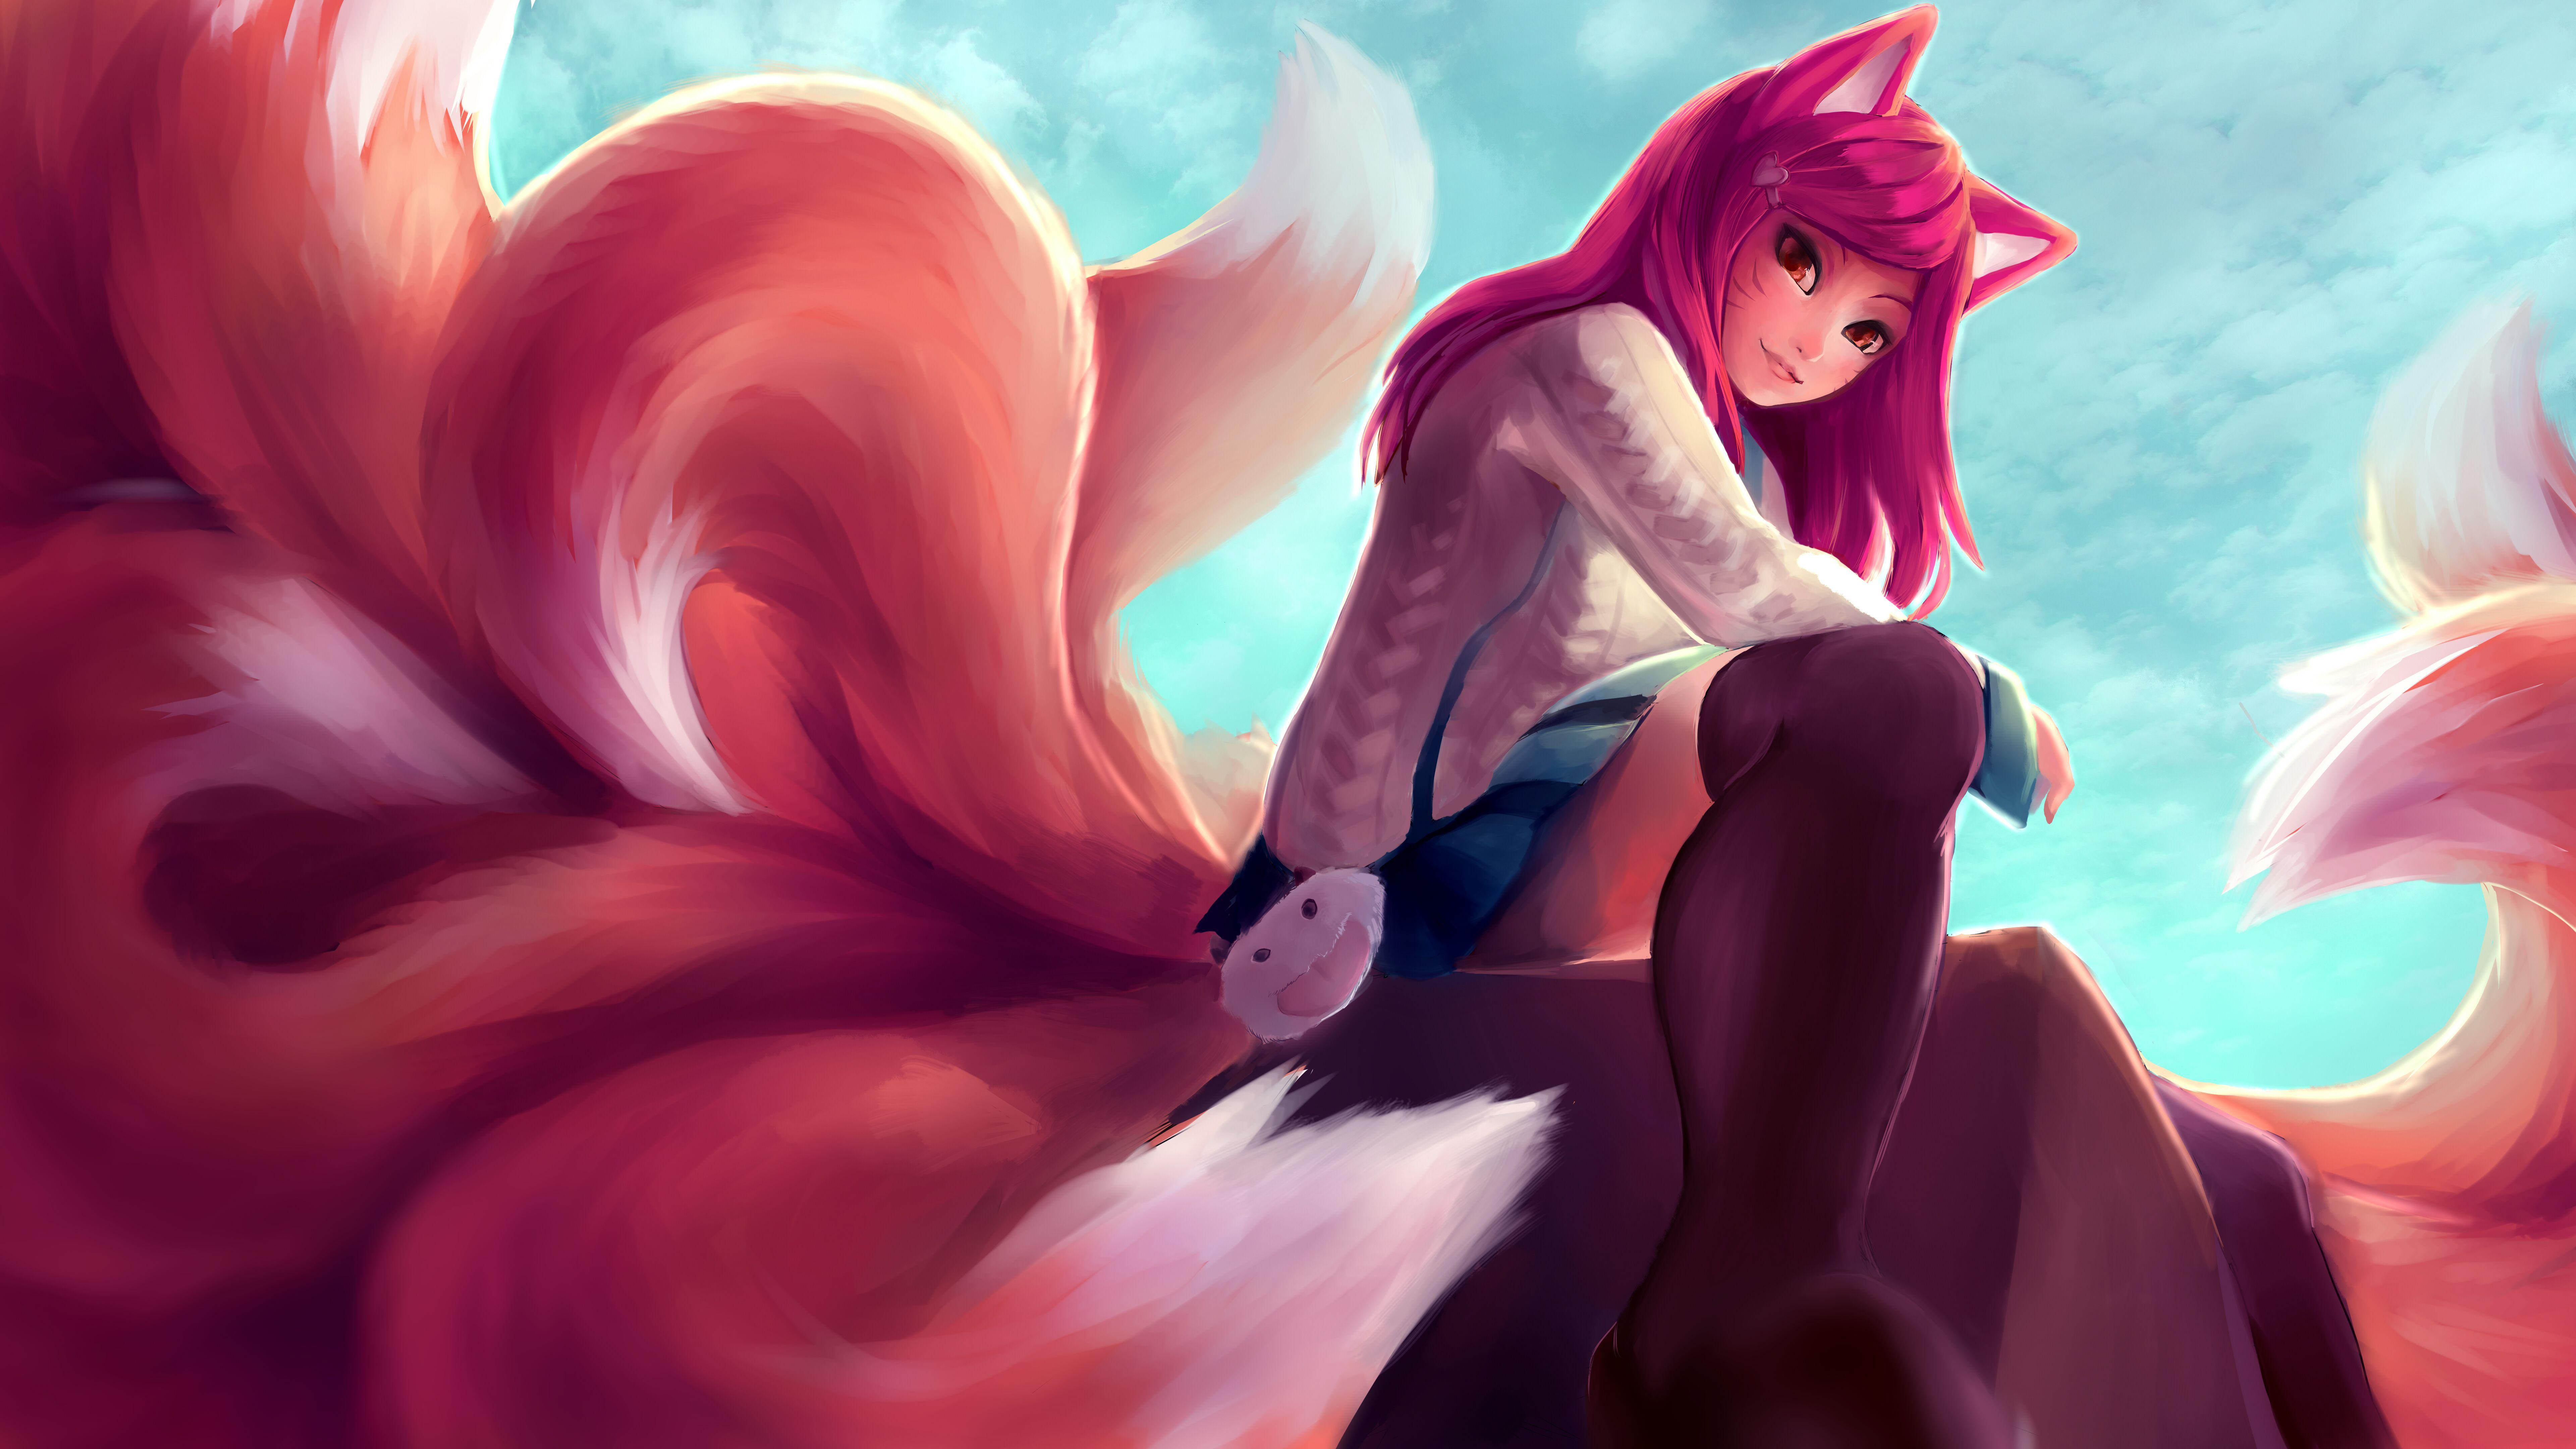 Ahri Anime Wallpapers Top Free Ahri Anime Backgrounds